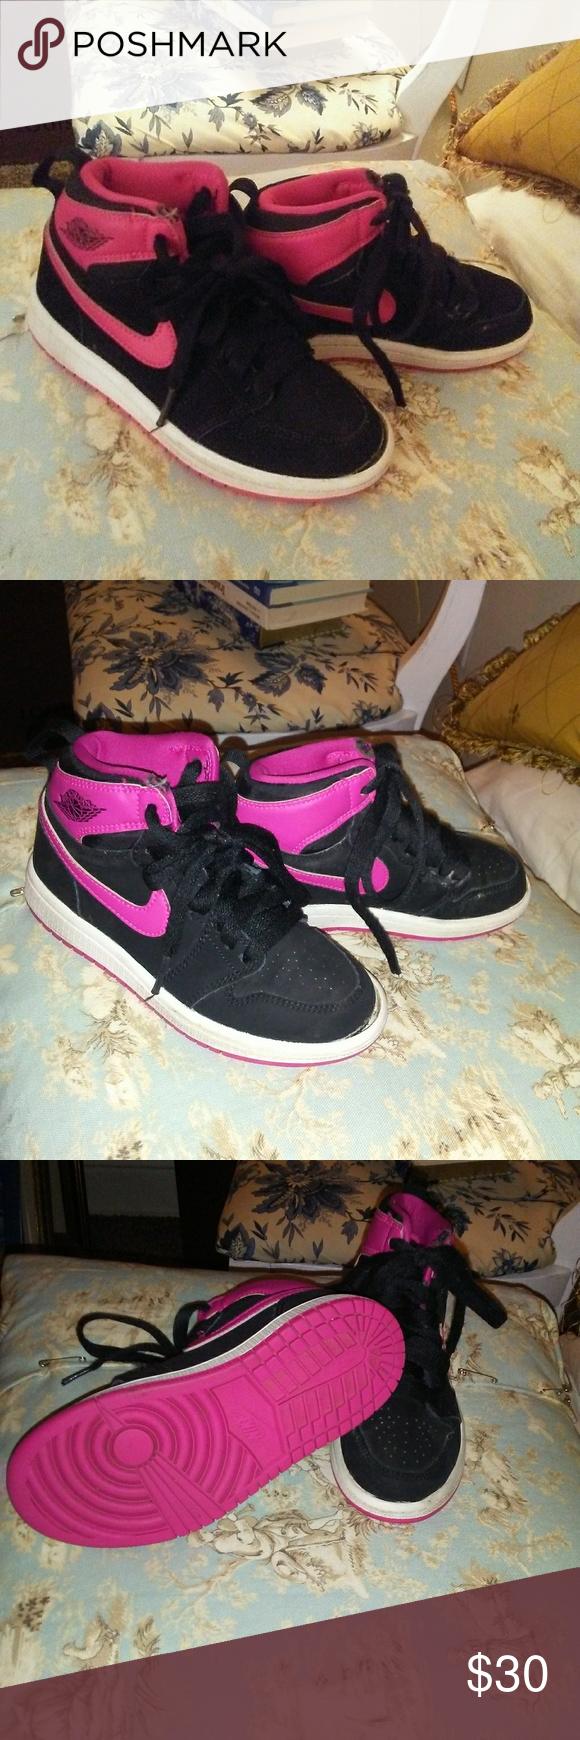 Baby Jordan s Size 11 Pink and Blank size 11 Air Jordan Shoes Baby Jordans d74b9d628